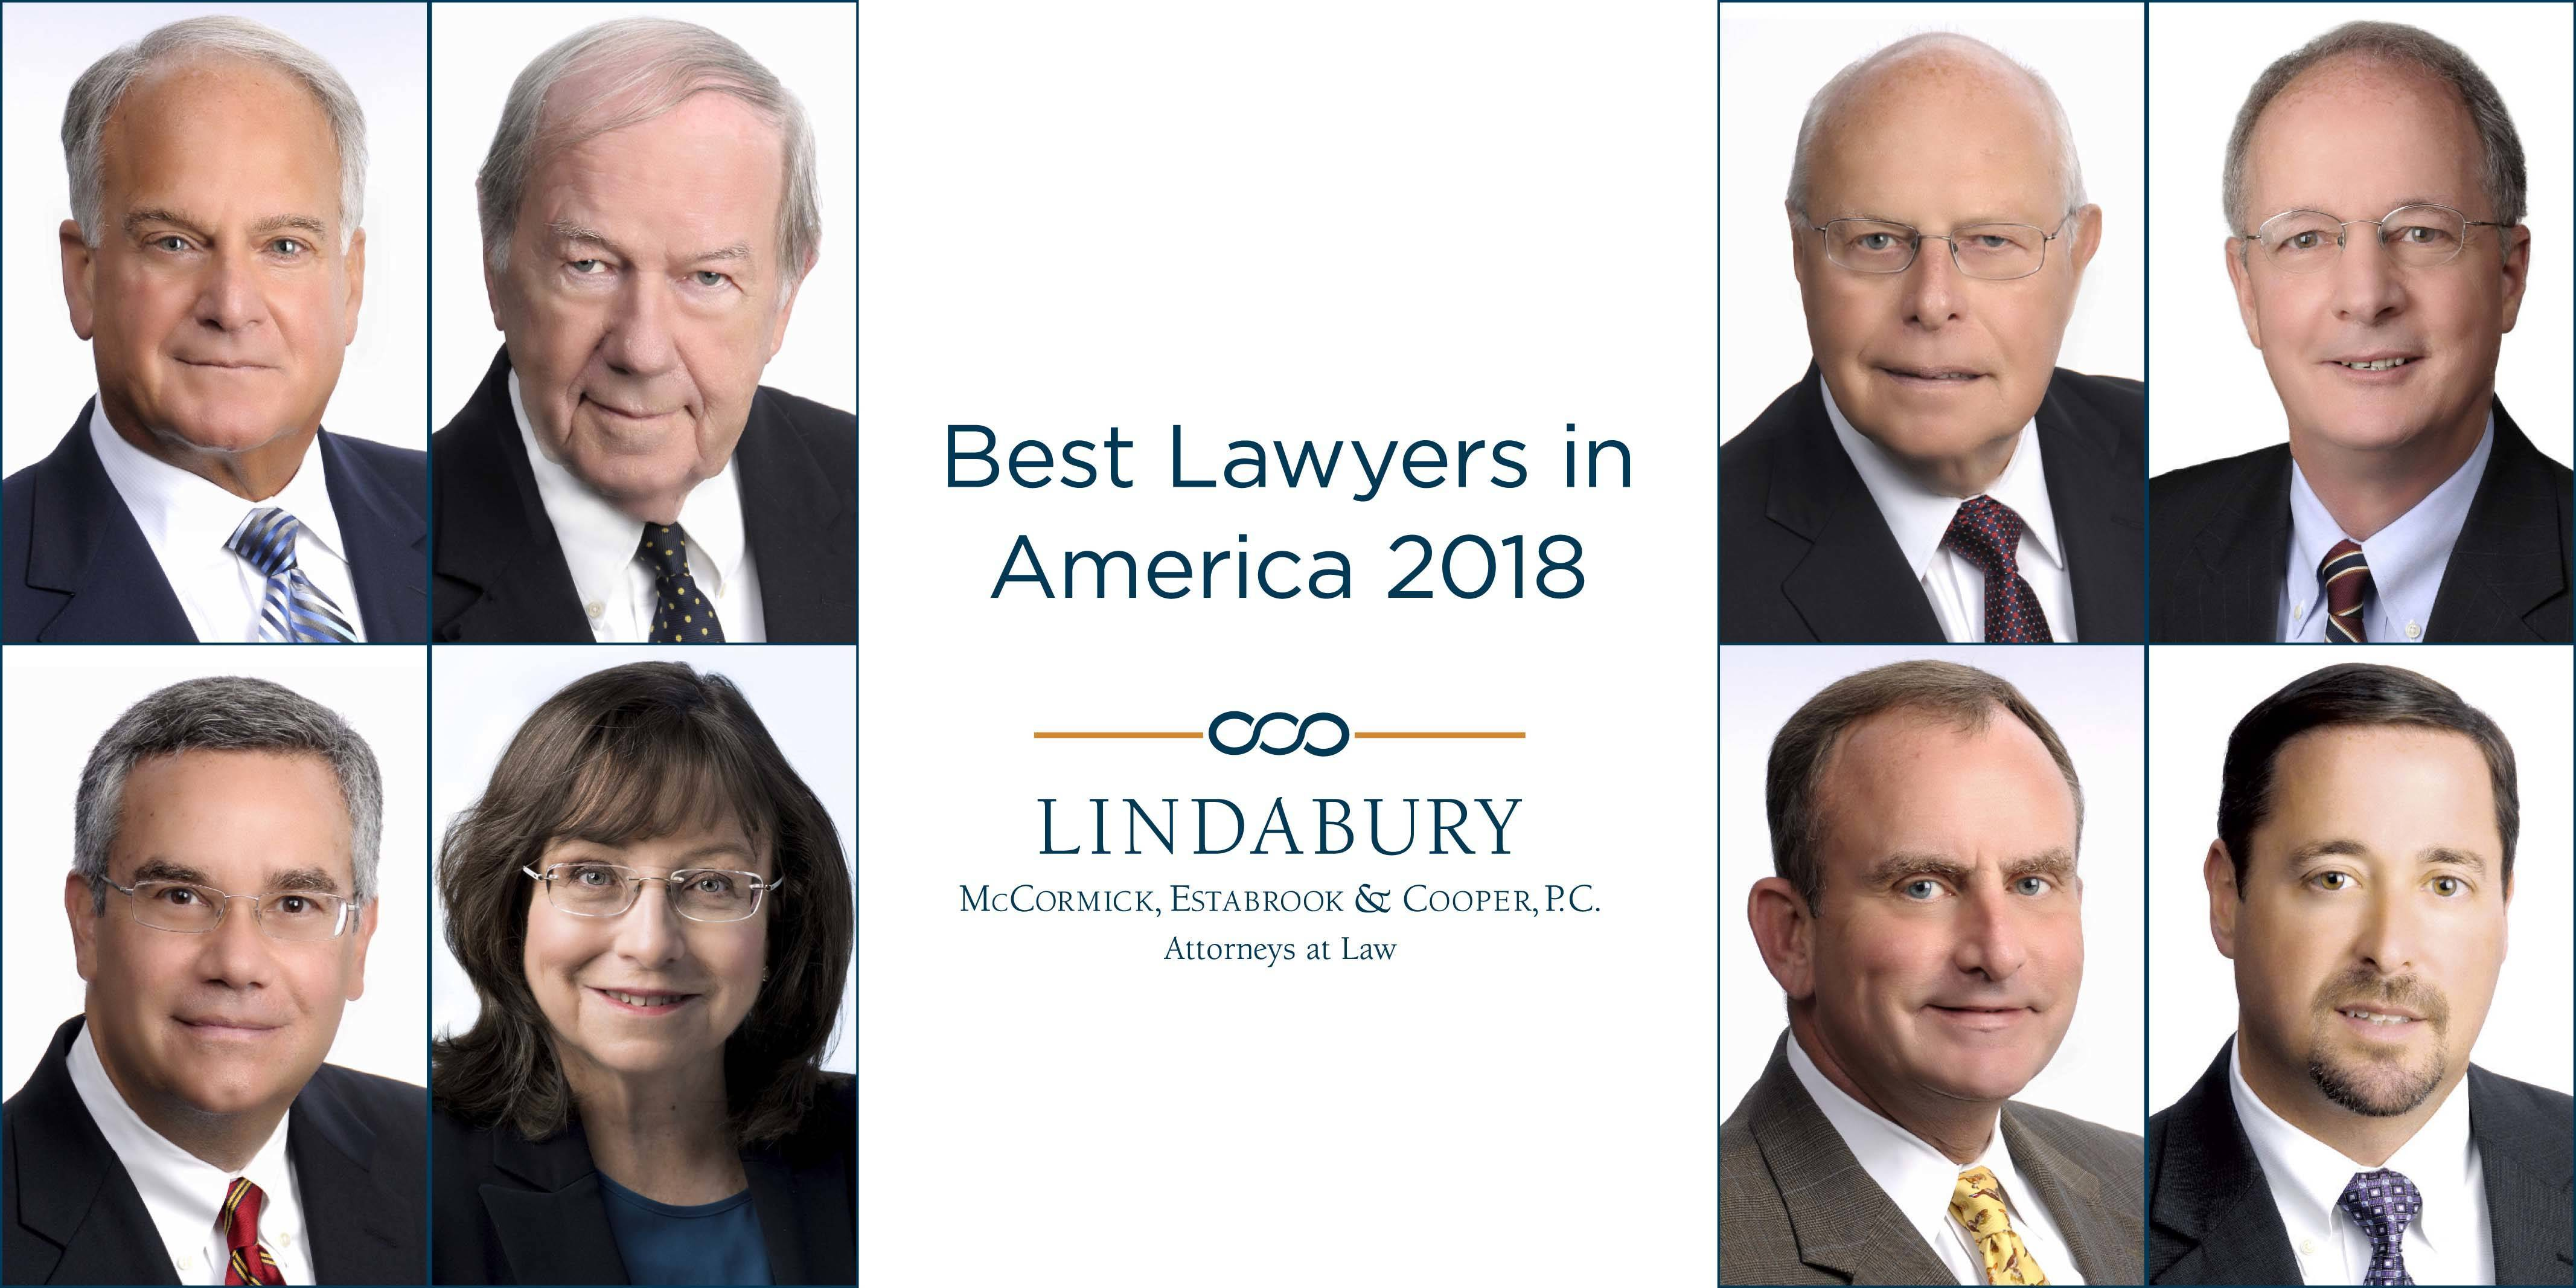 dc094746da8a80708542_Collage_Best_Lawyers_America_2018_Landscape_.jpg